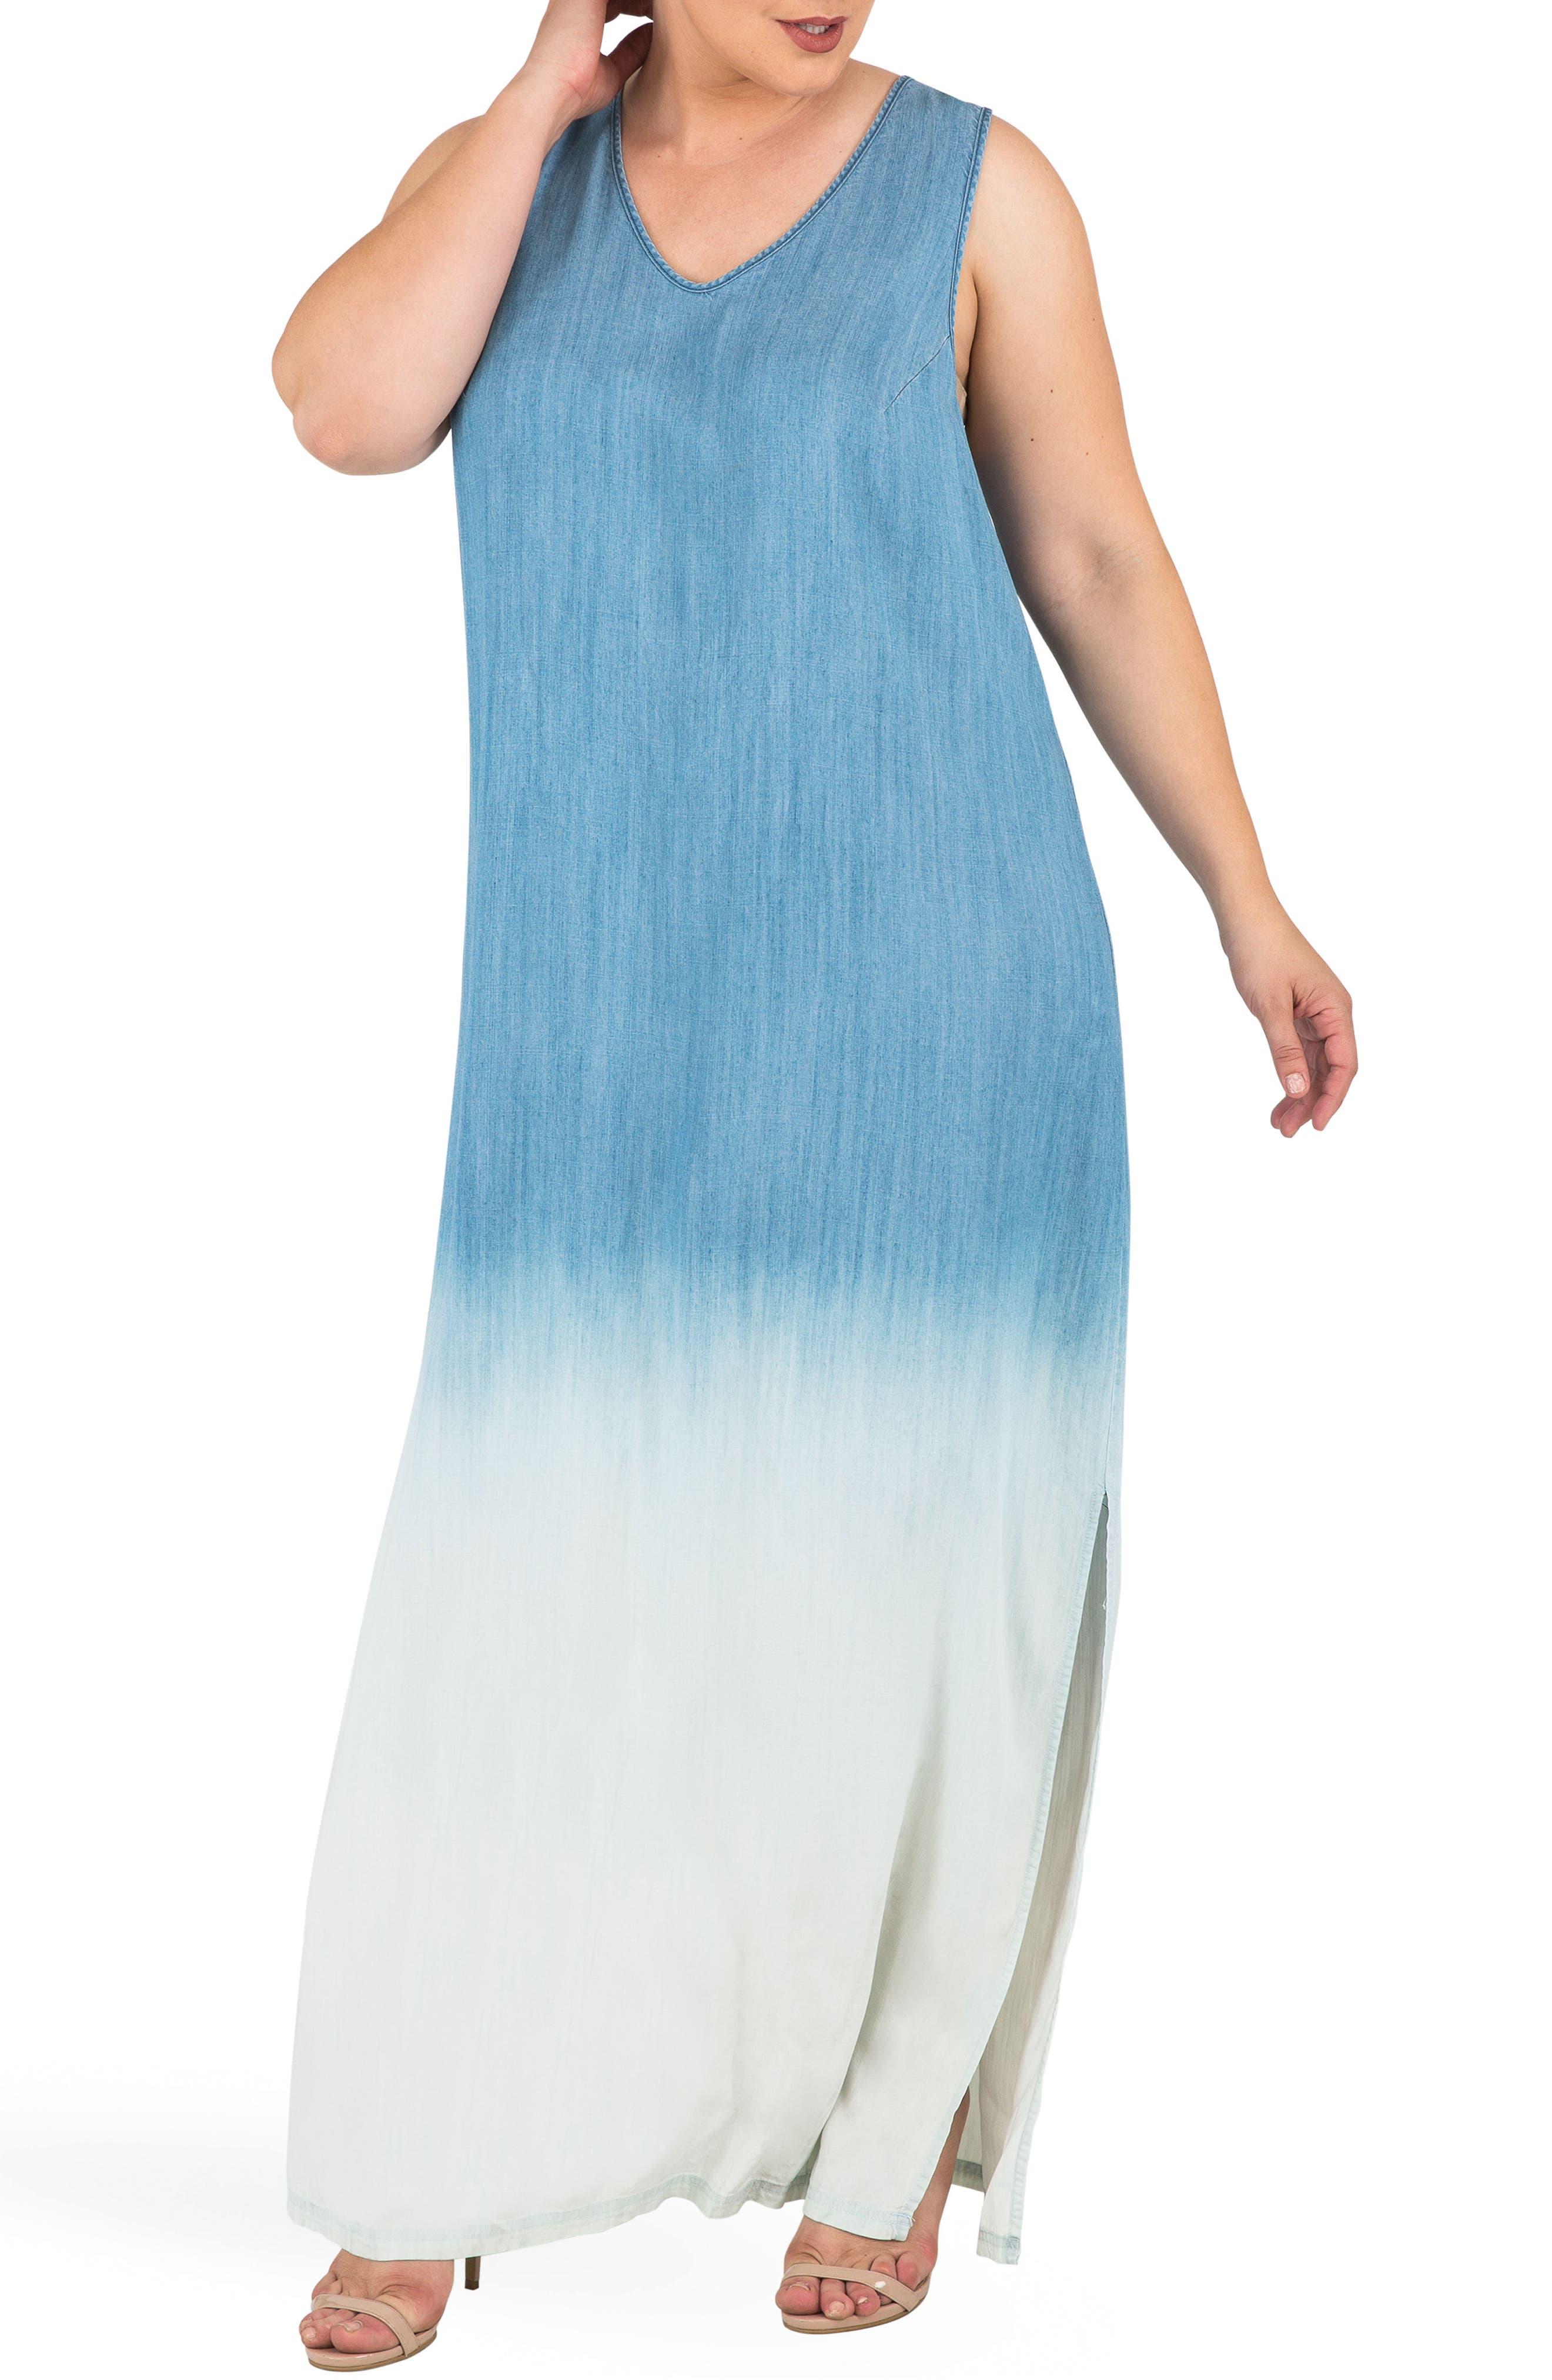 Angie Ombré Chmbray Maxi Dress,                             Main thumbnail 1, color,                             Blue